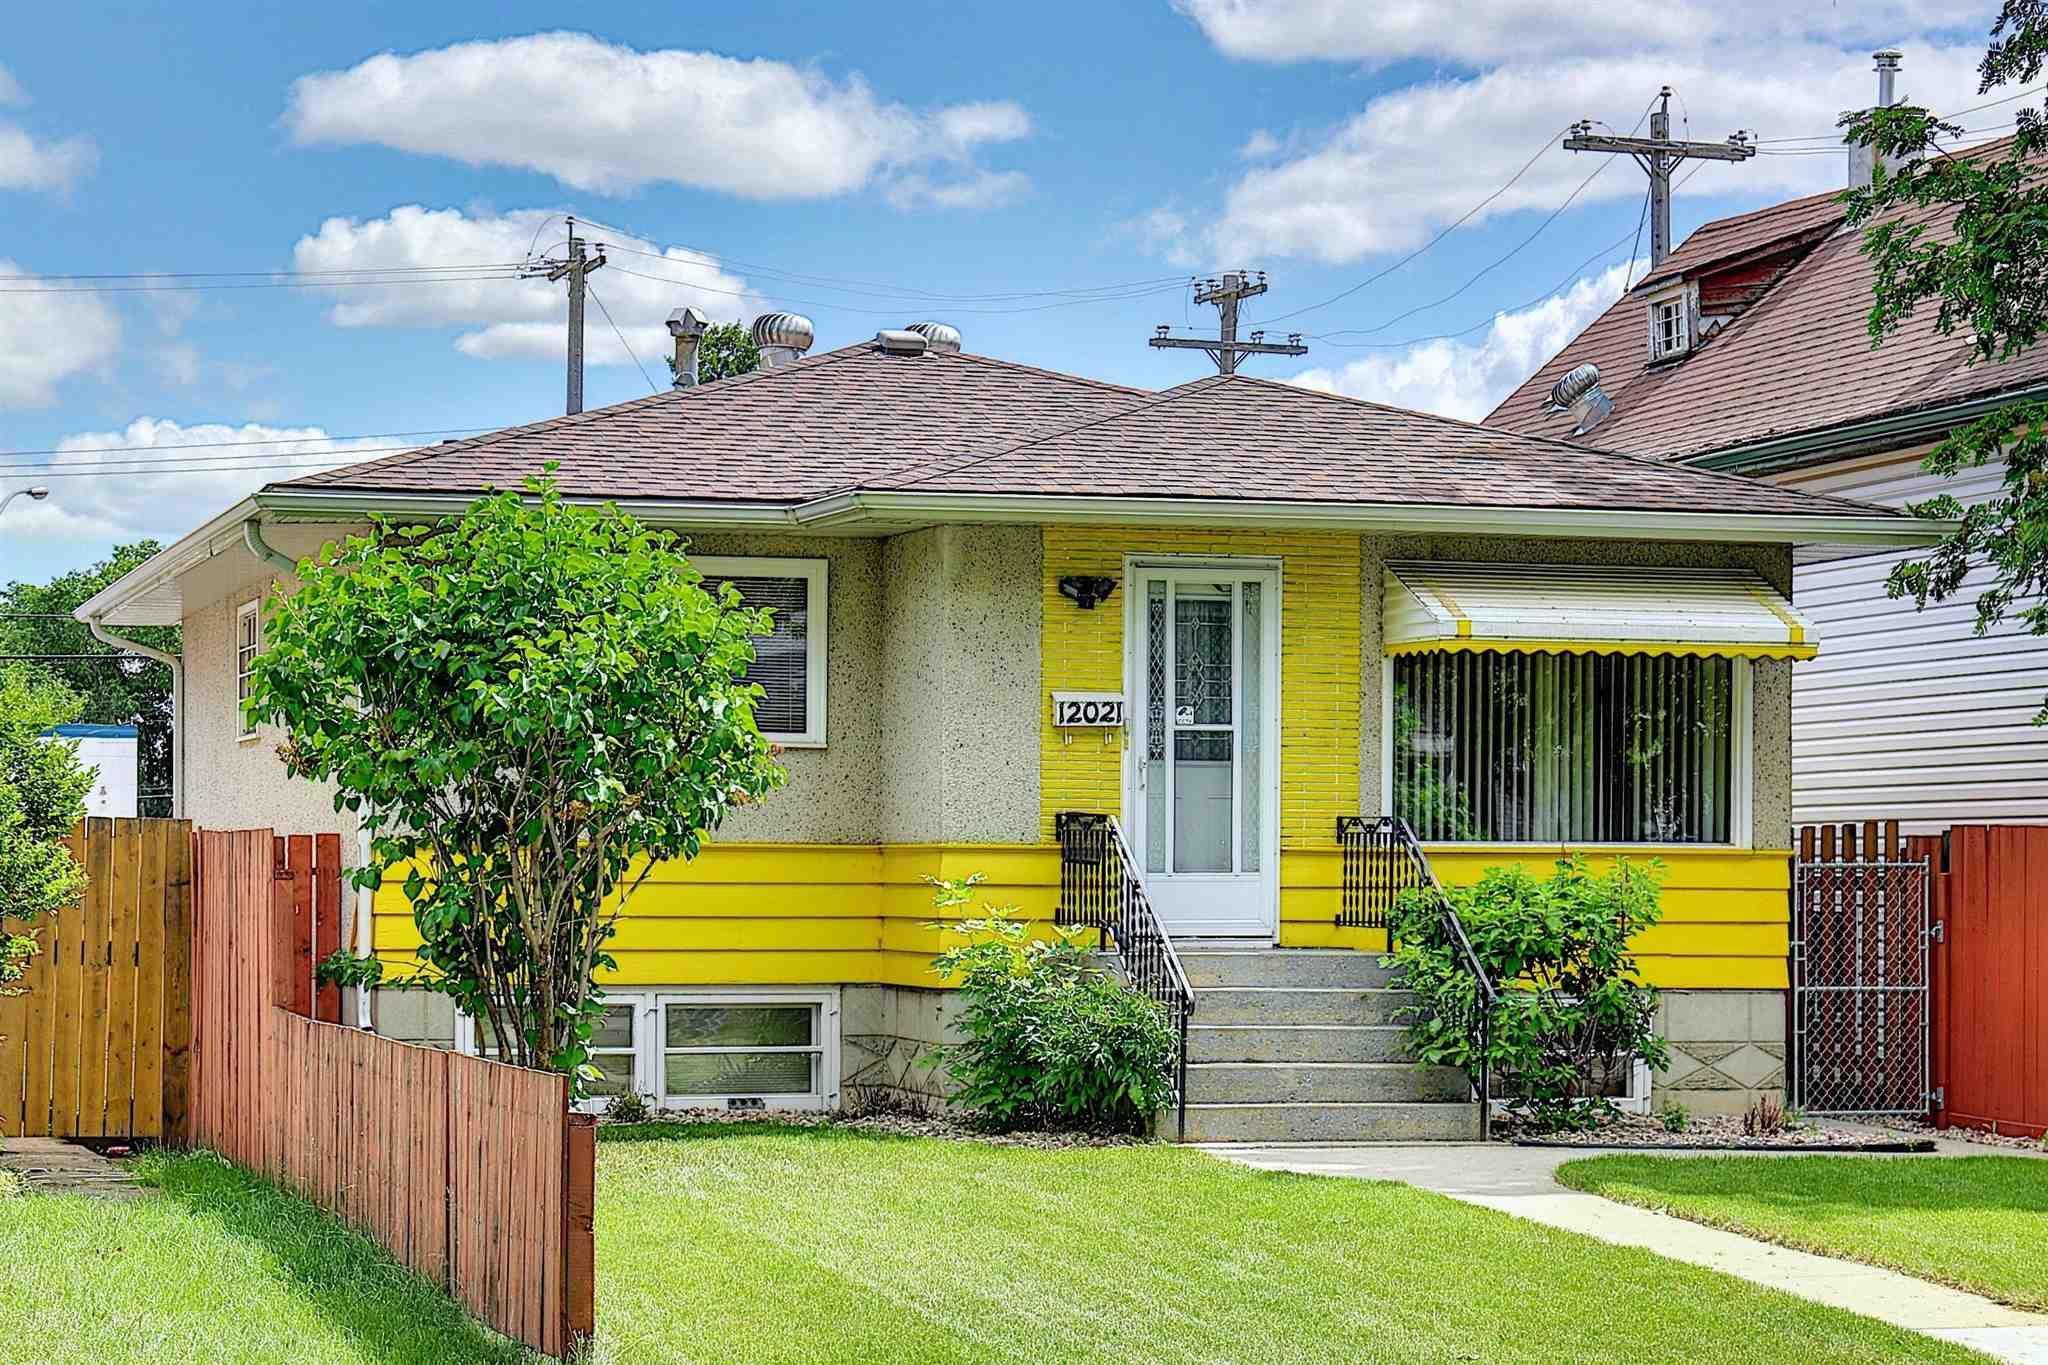 Main Photo: 12021 79 Street in Edmonton: Zone 05 House for sale : MLS®# E4251373